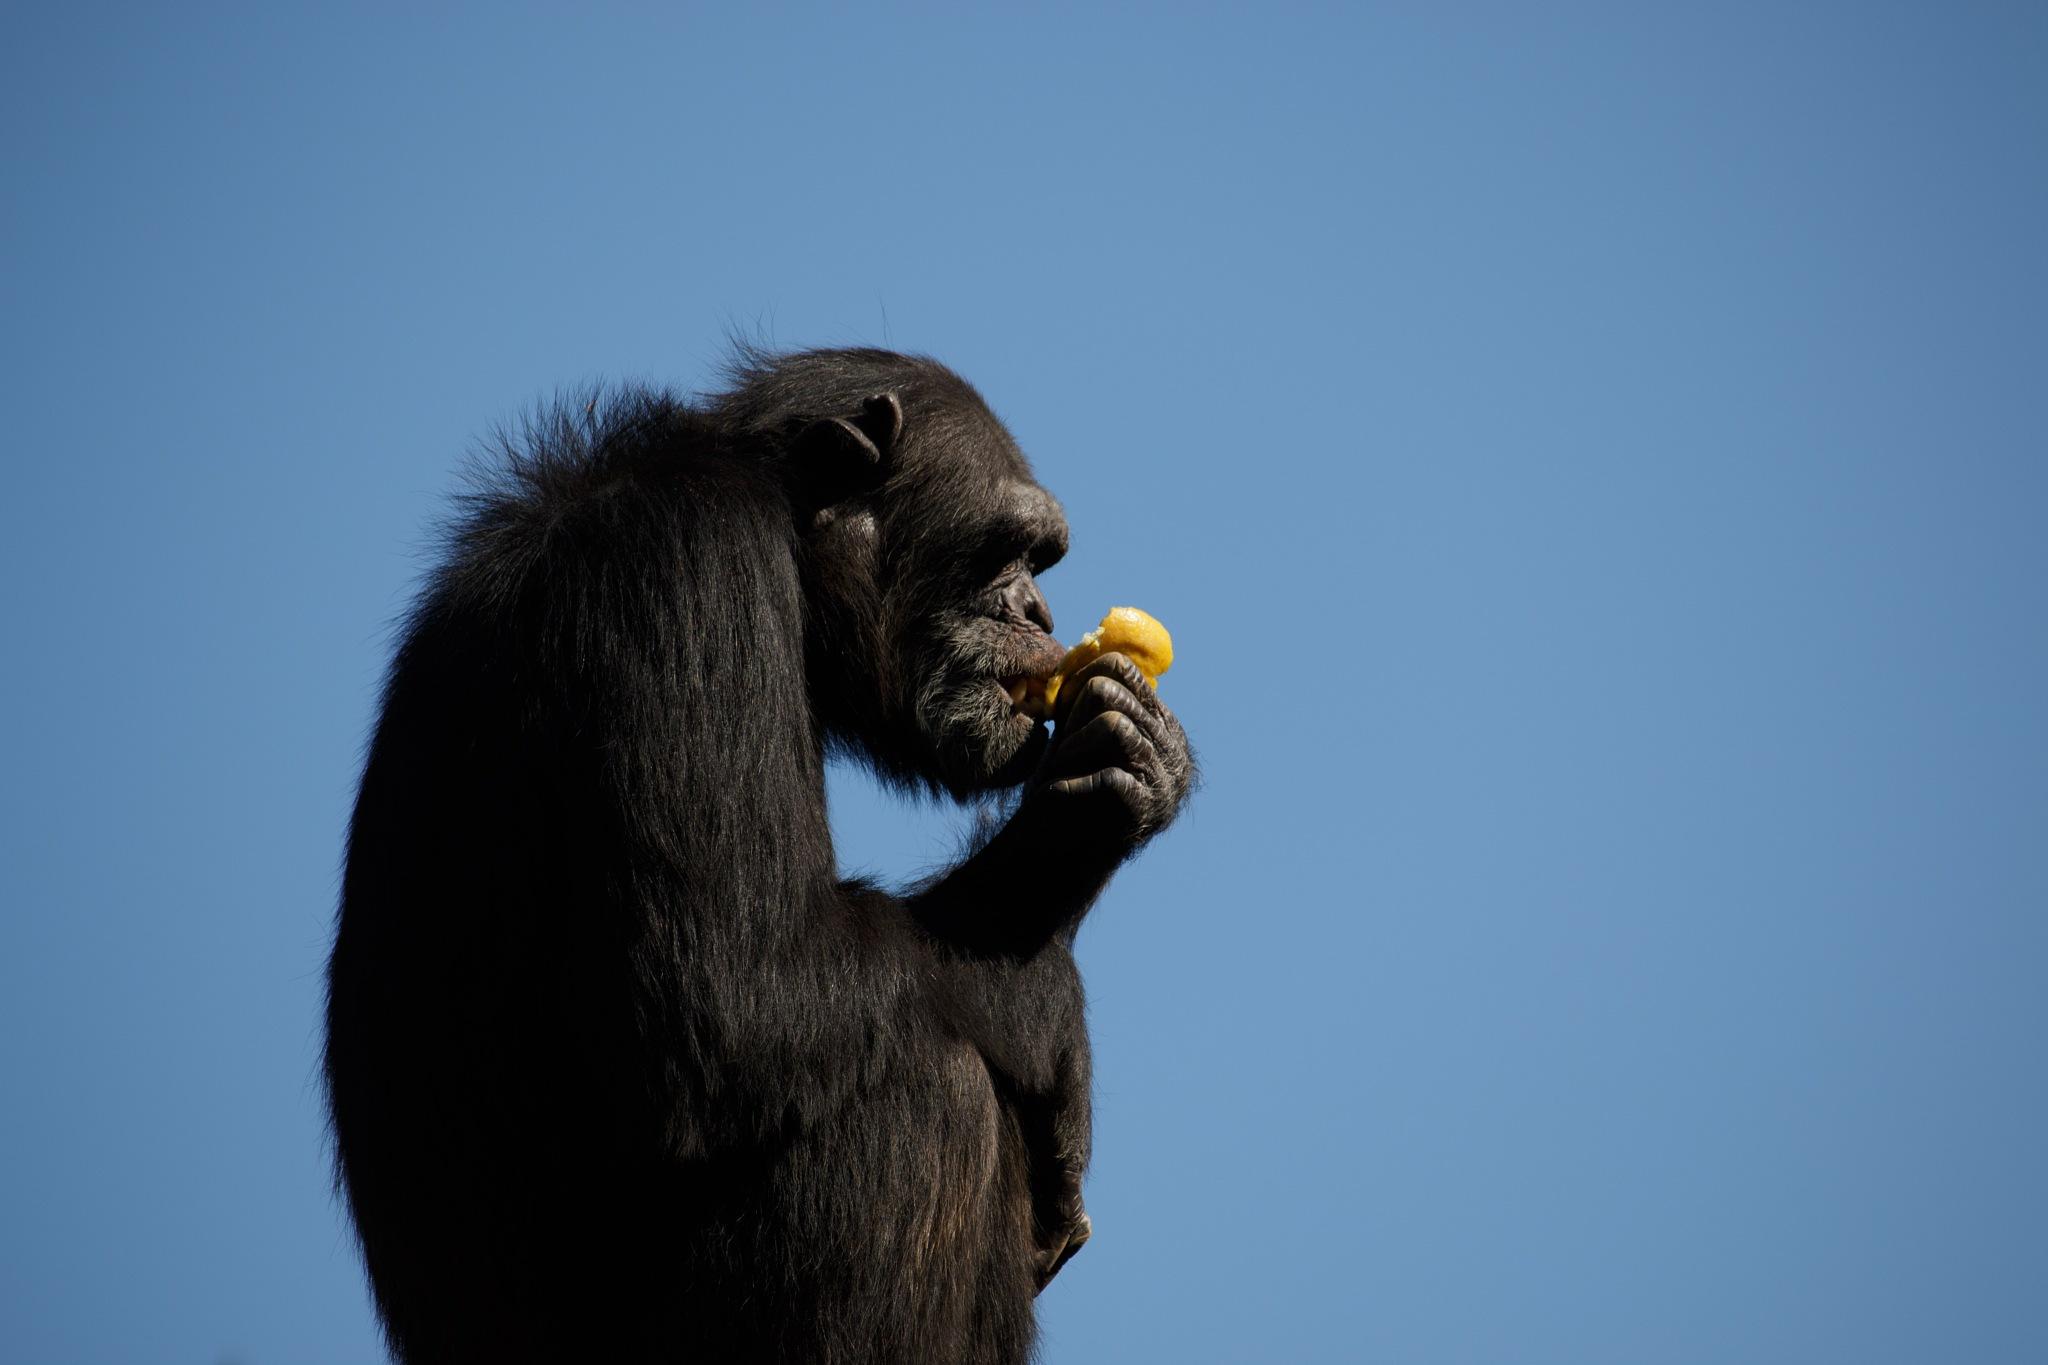 Chimpansee enjoying an orange by Henk de Groot